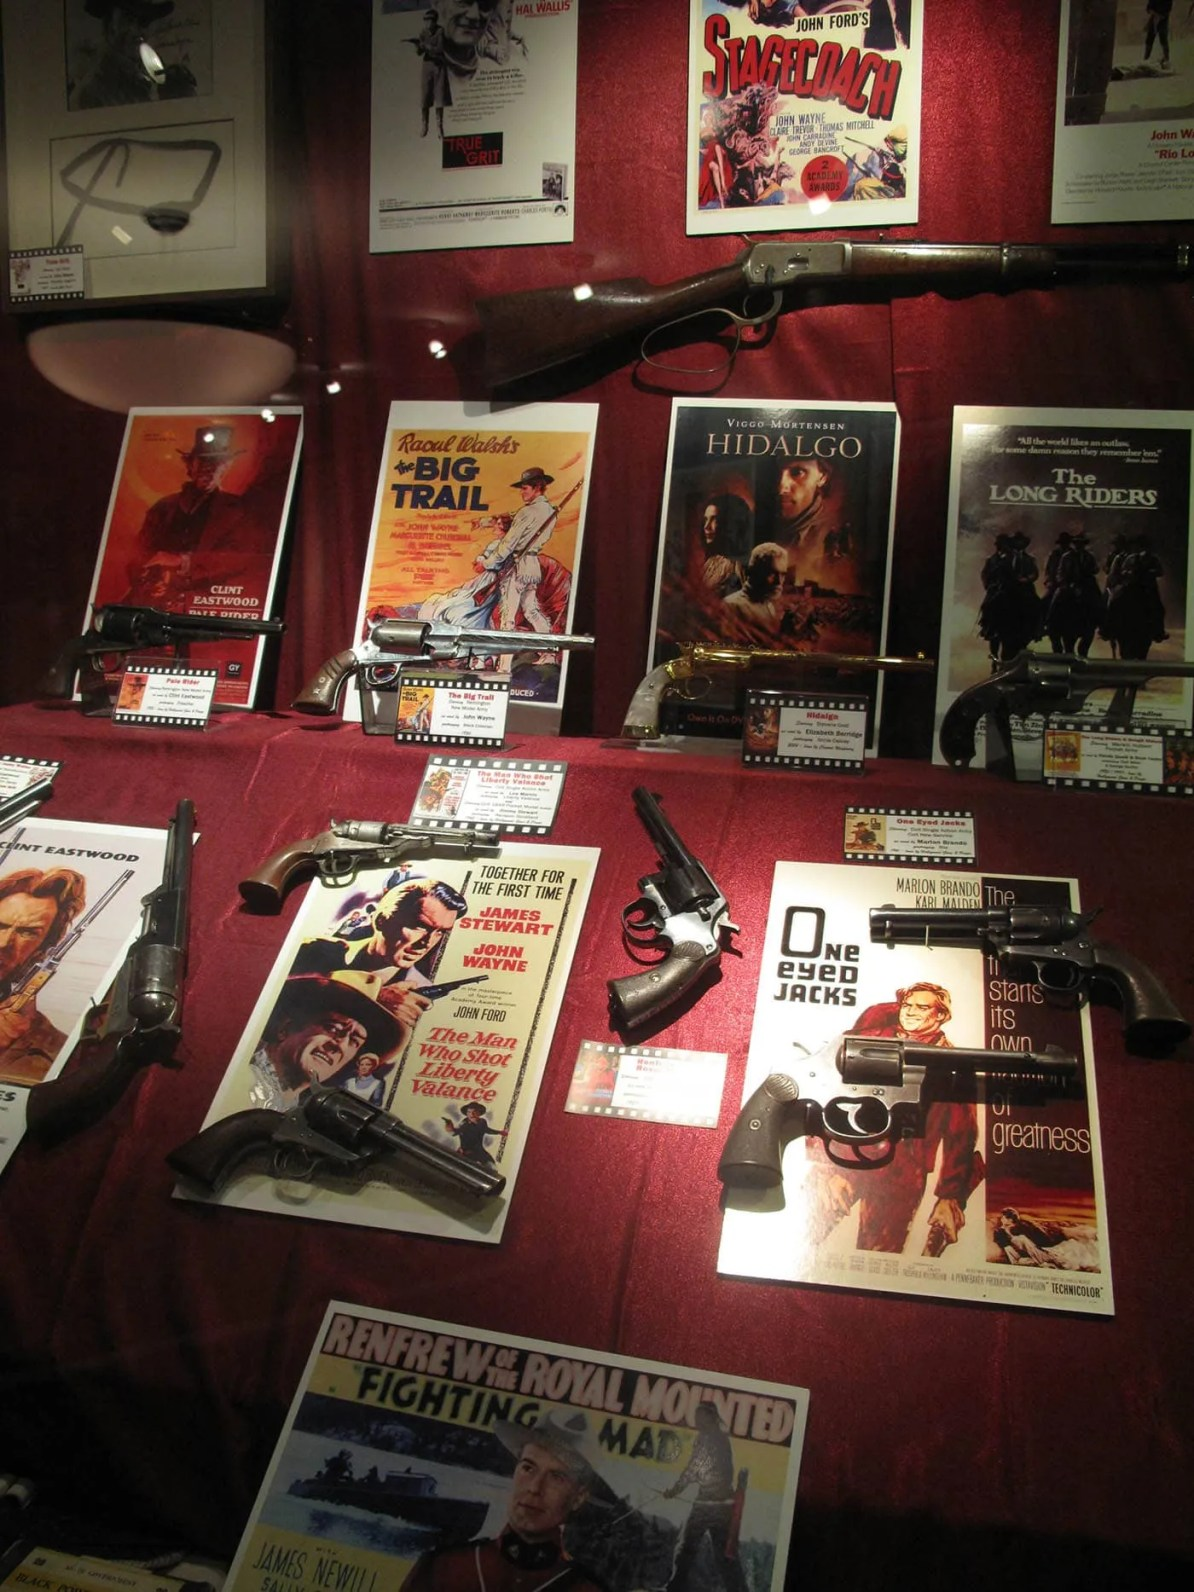 NRA National Firearms Museum in Fairfax, Virginia